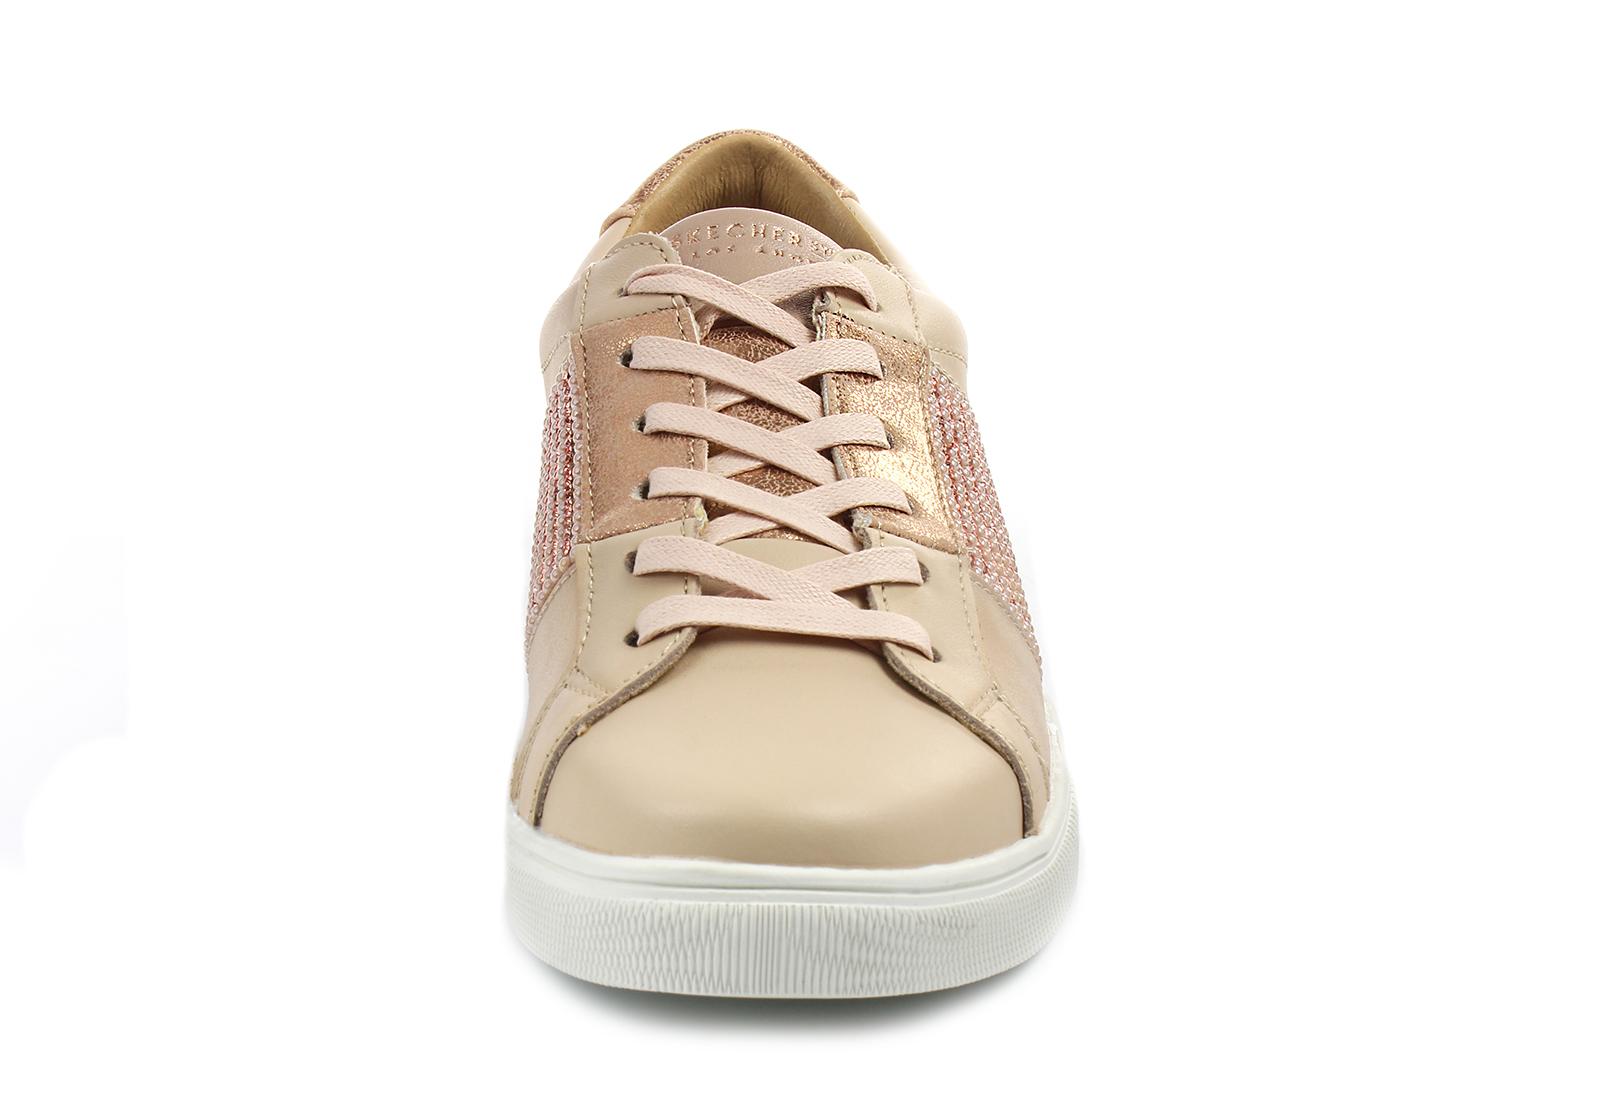 a tiempo Iluminar Indígena  Skechers Pantofi - Moda - Bling Bandit - 73493-ltpk - Office Shoes Romania